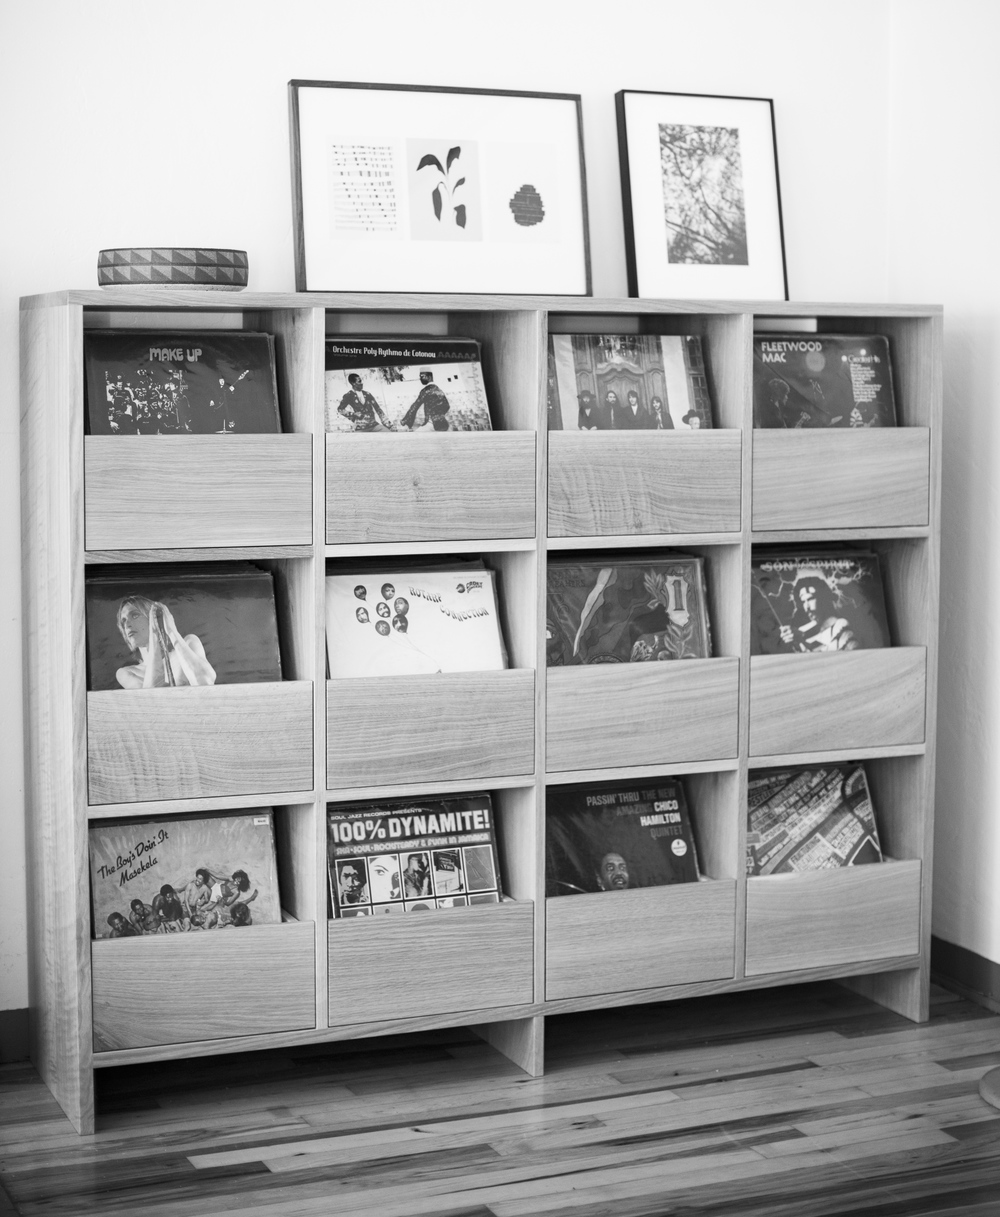 Killscrow Vinyl Cabinet B&W